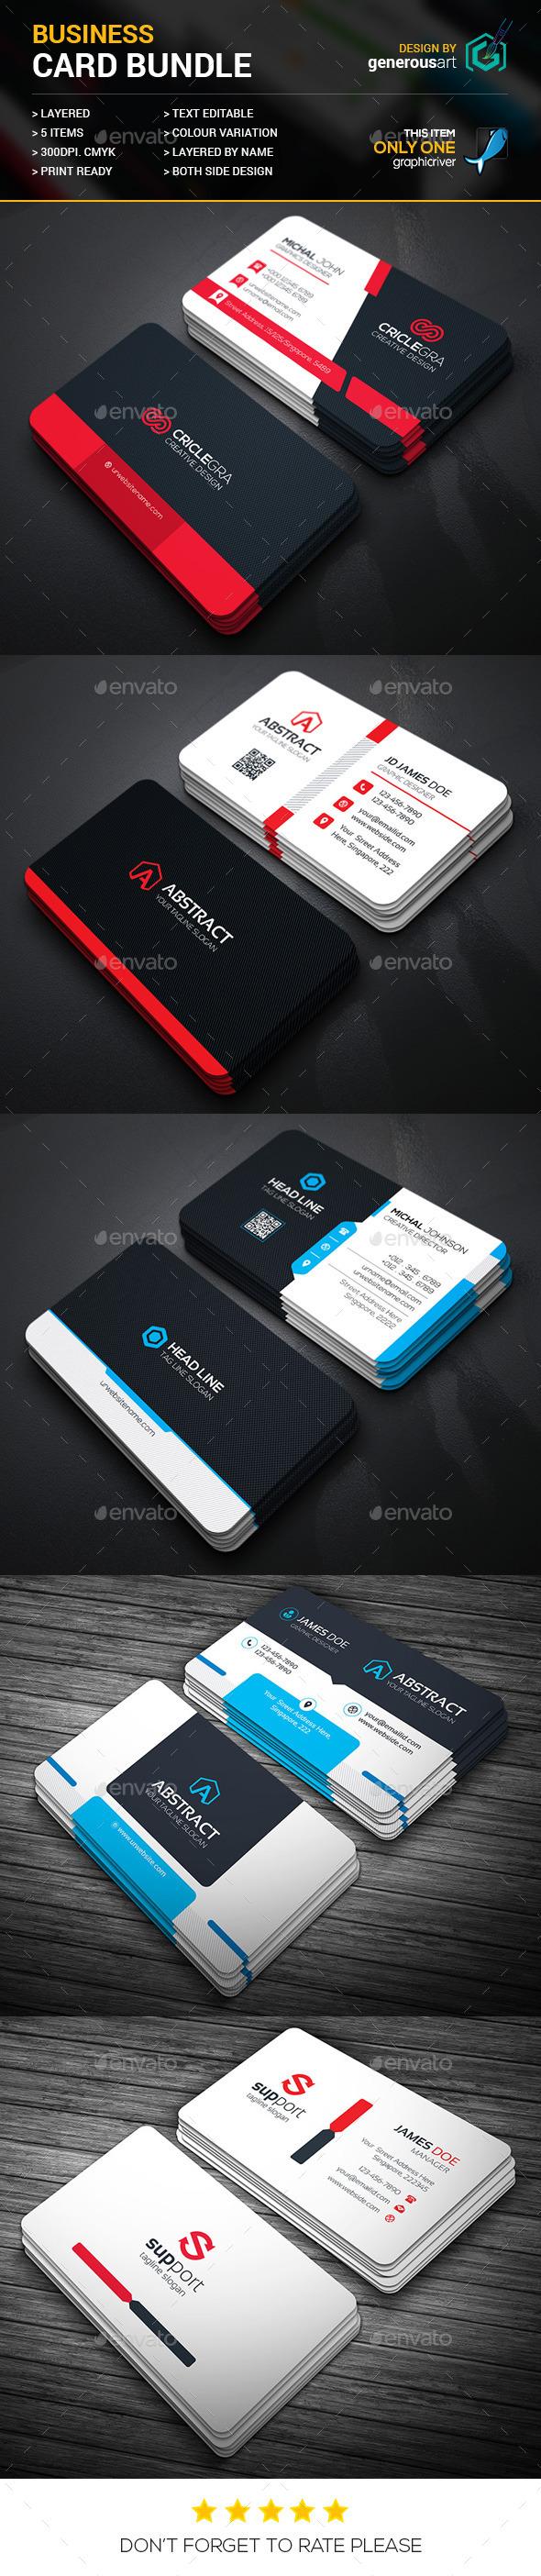 Business Card Bundle 5 in 1 Vol 24